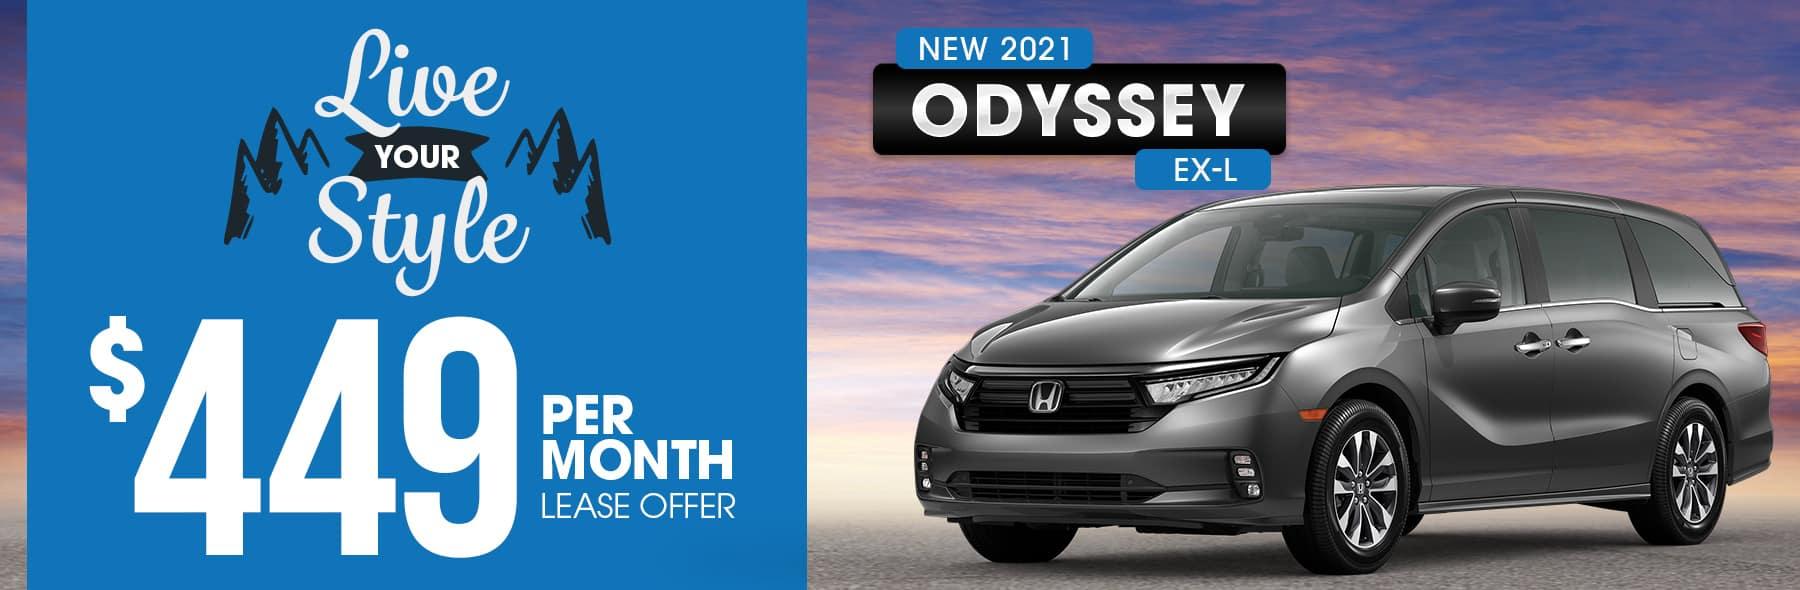 IGH-May21-HP-Odyssey-v1